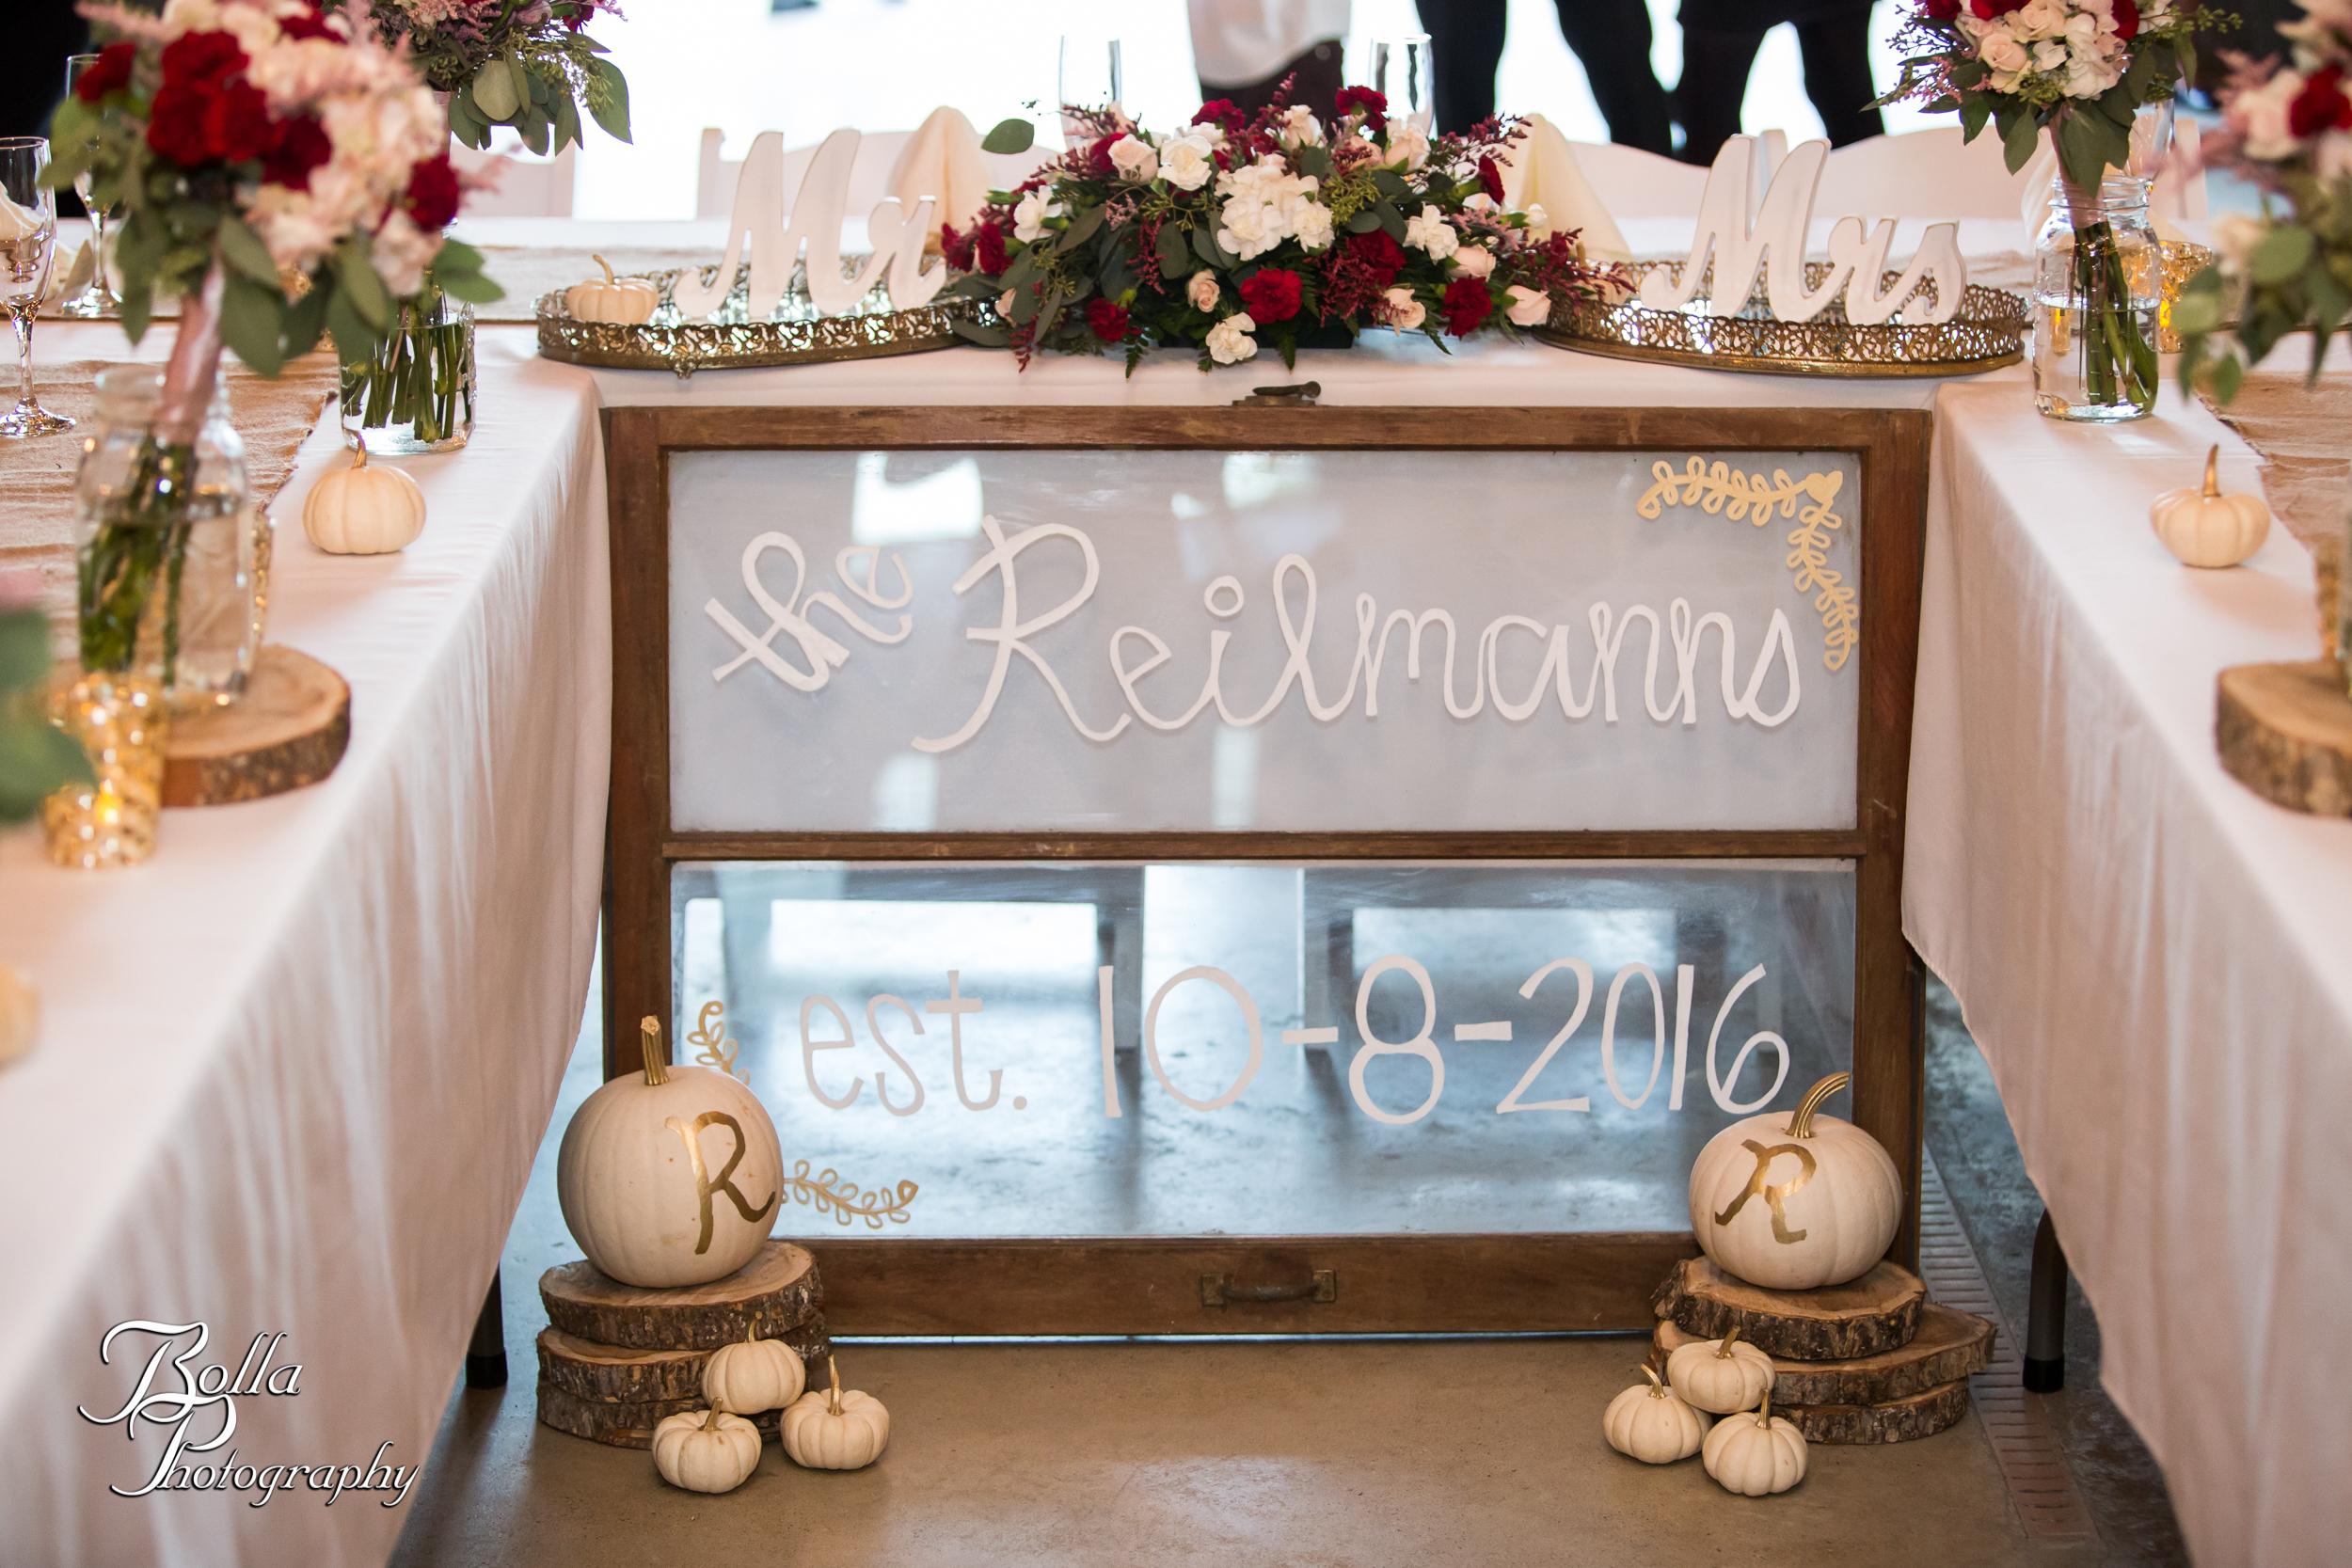 Bolla_photography_edwardsville_wedding_photographer_st_louis_weddings_Reilmann-0422.jpg